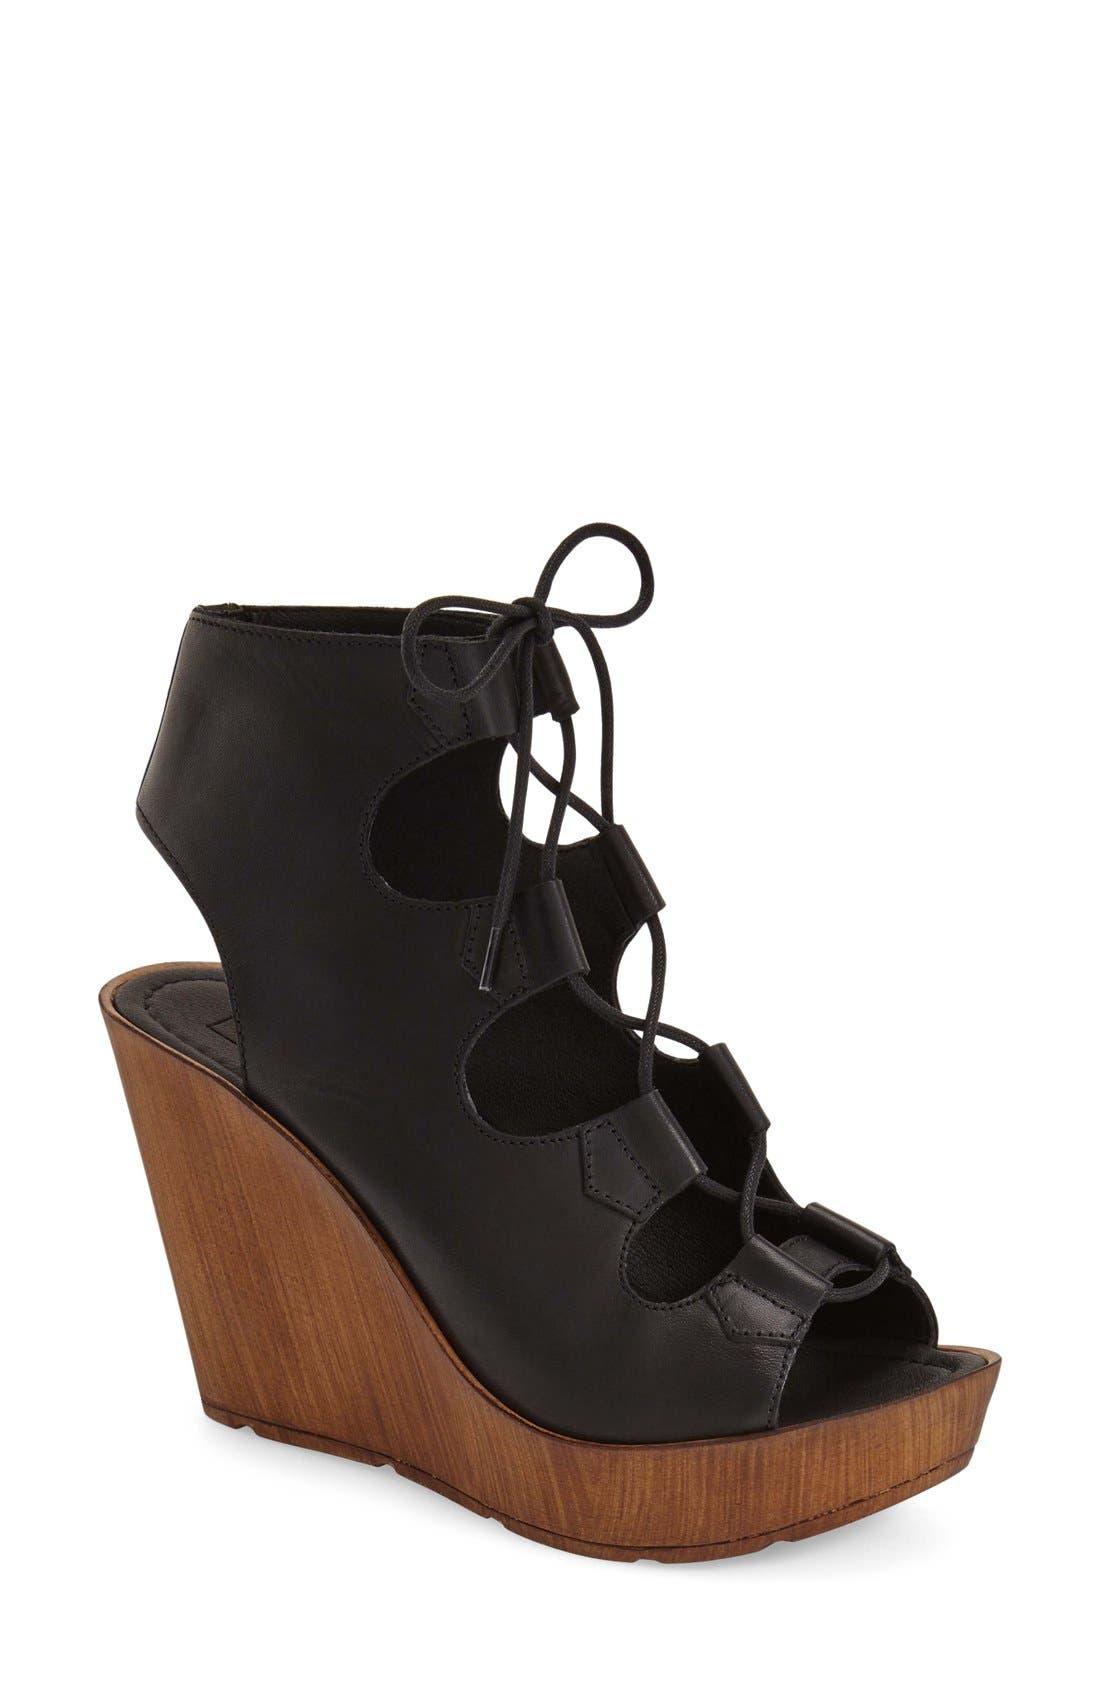 Alternate Image 1 Selected - Topshop 'Wanda' Ghillie Wedge Sandal (Women)